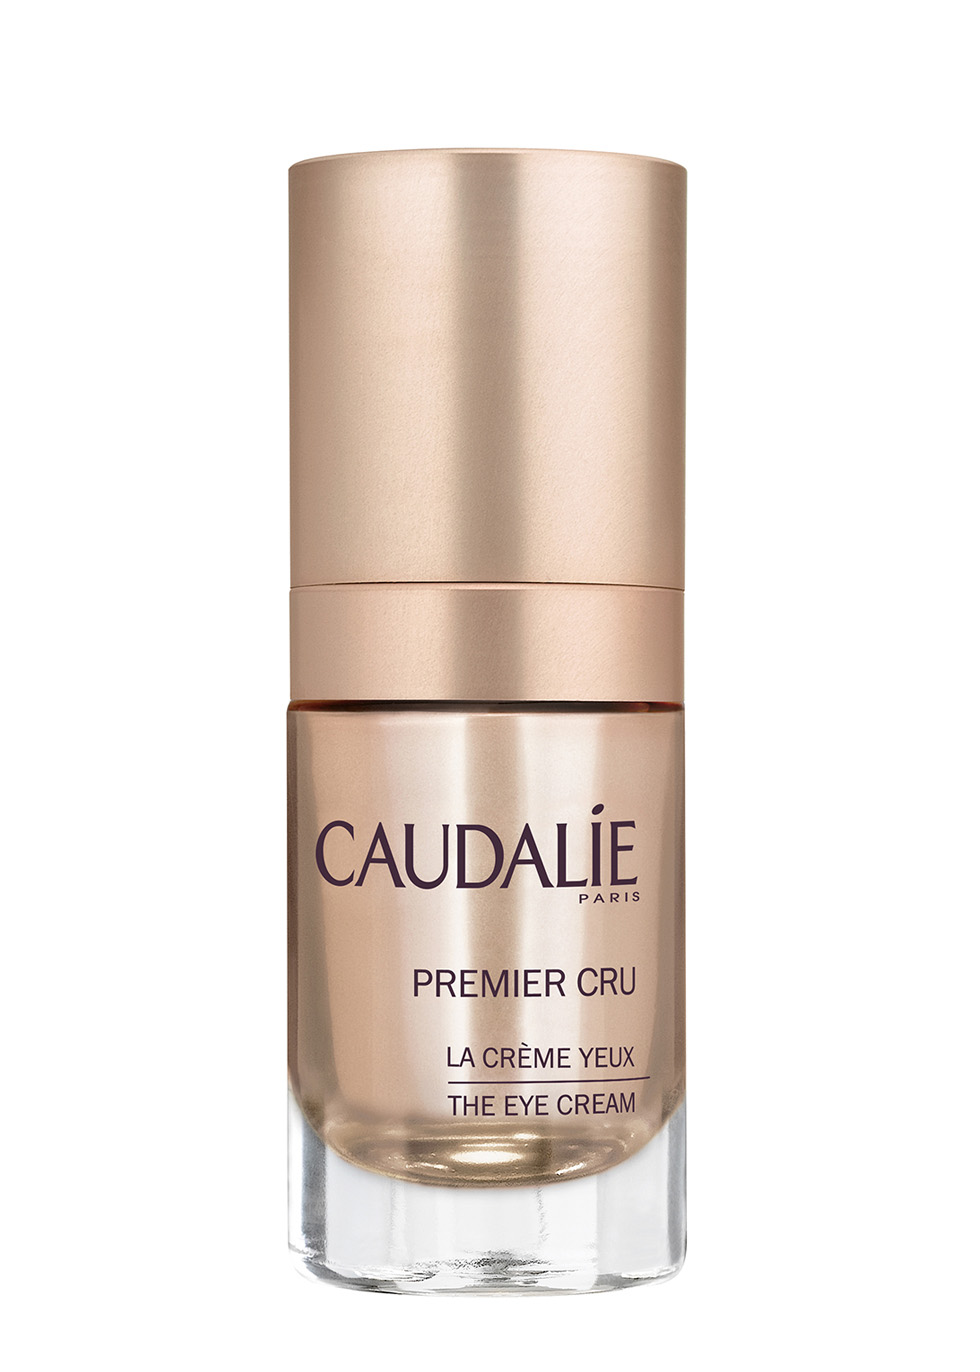 Premier Cru The Eye Cream 15ml